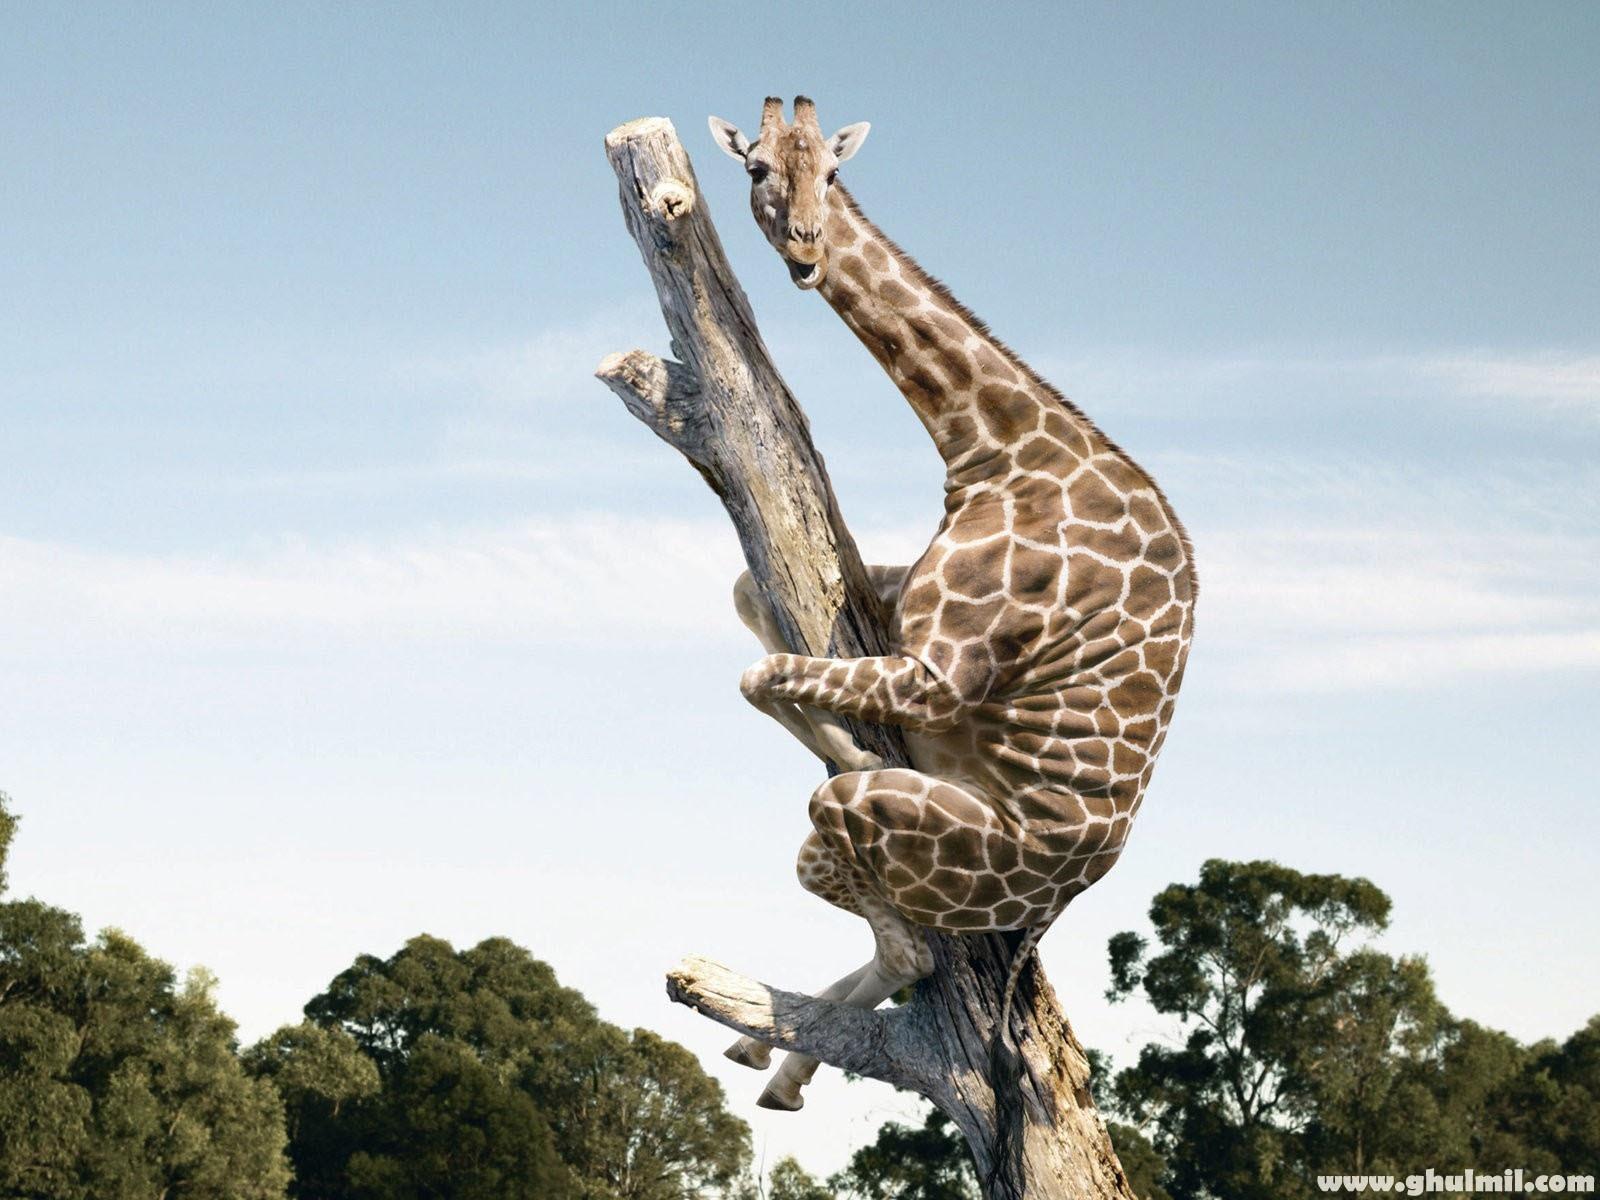 3d White Rose Wallpaper Funny Giraffe Climbing Dry Tree Dream Wallpapers